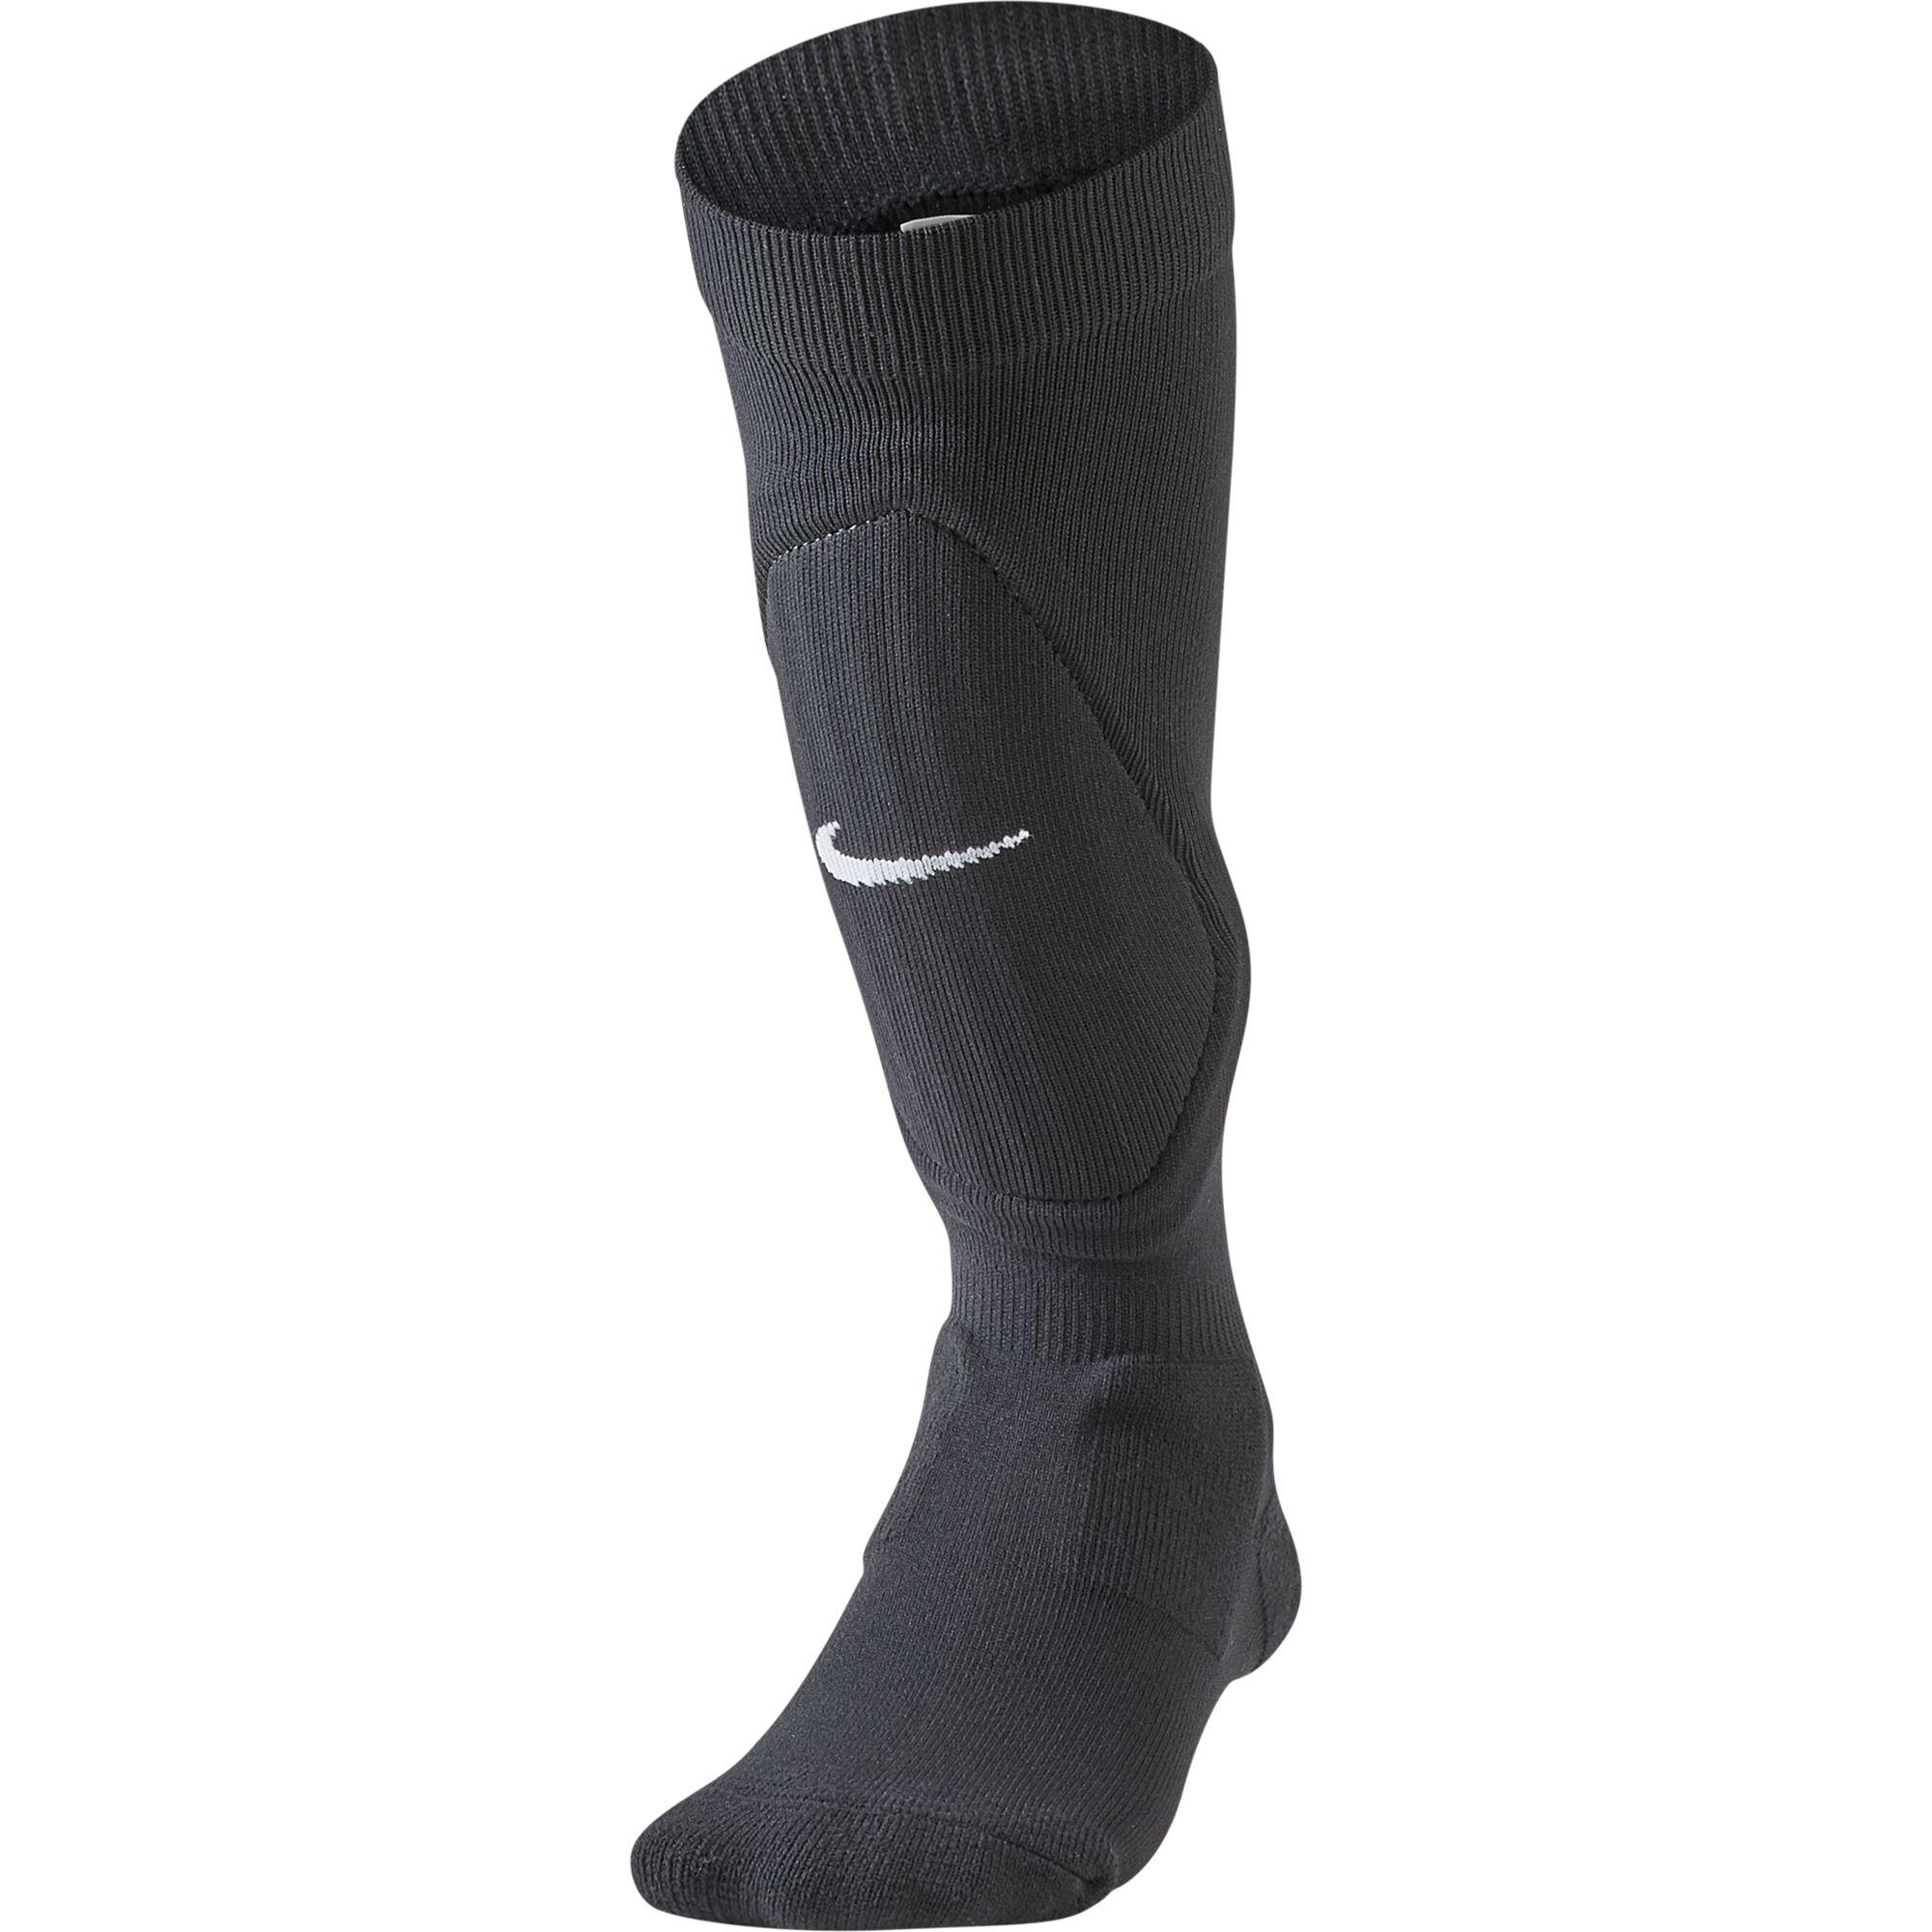 Shin Sock III Shin Guard, Black, swatch